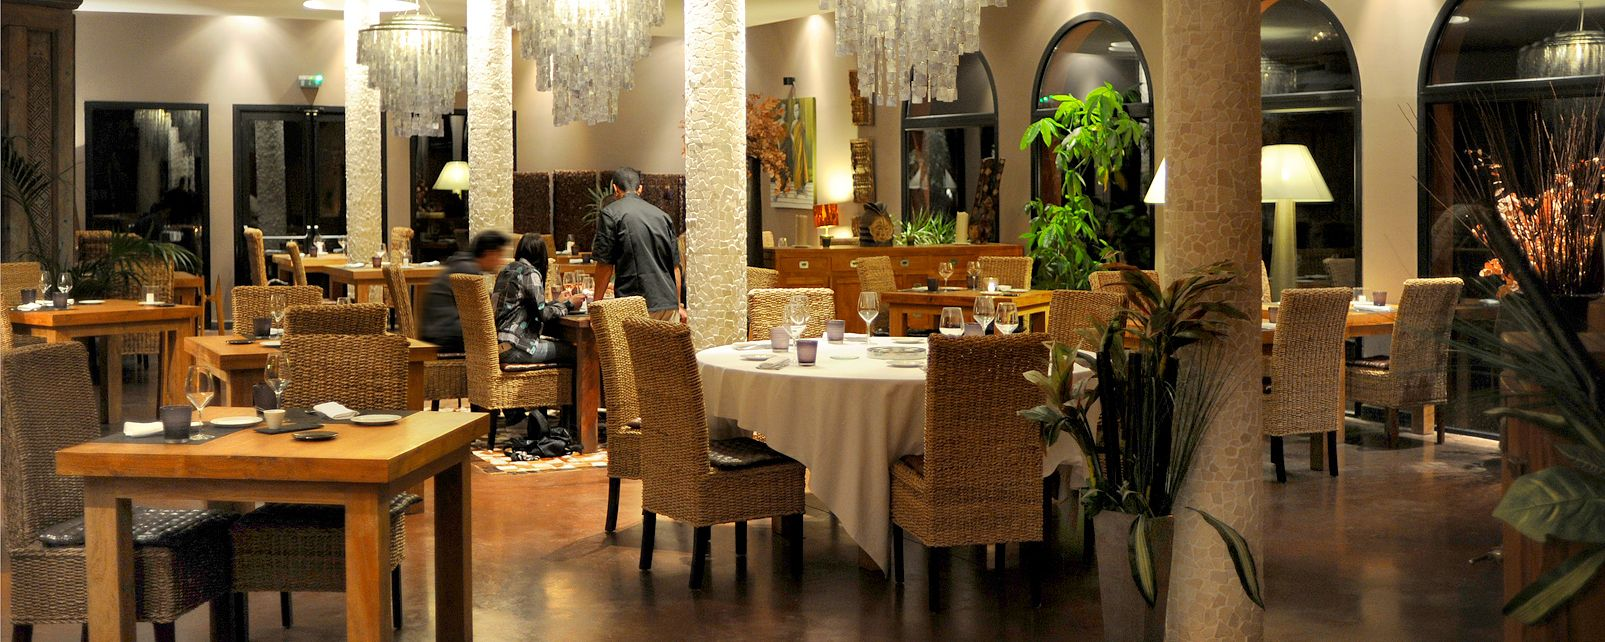 Hôtel Disini Spa Hotel